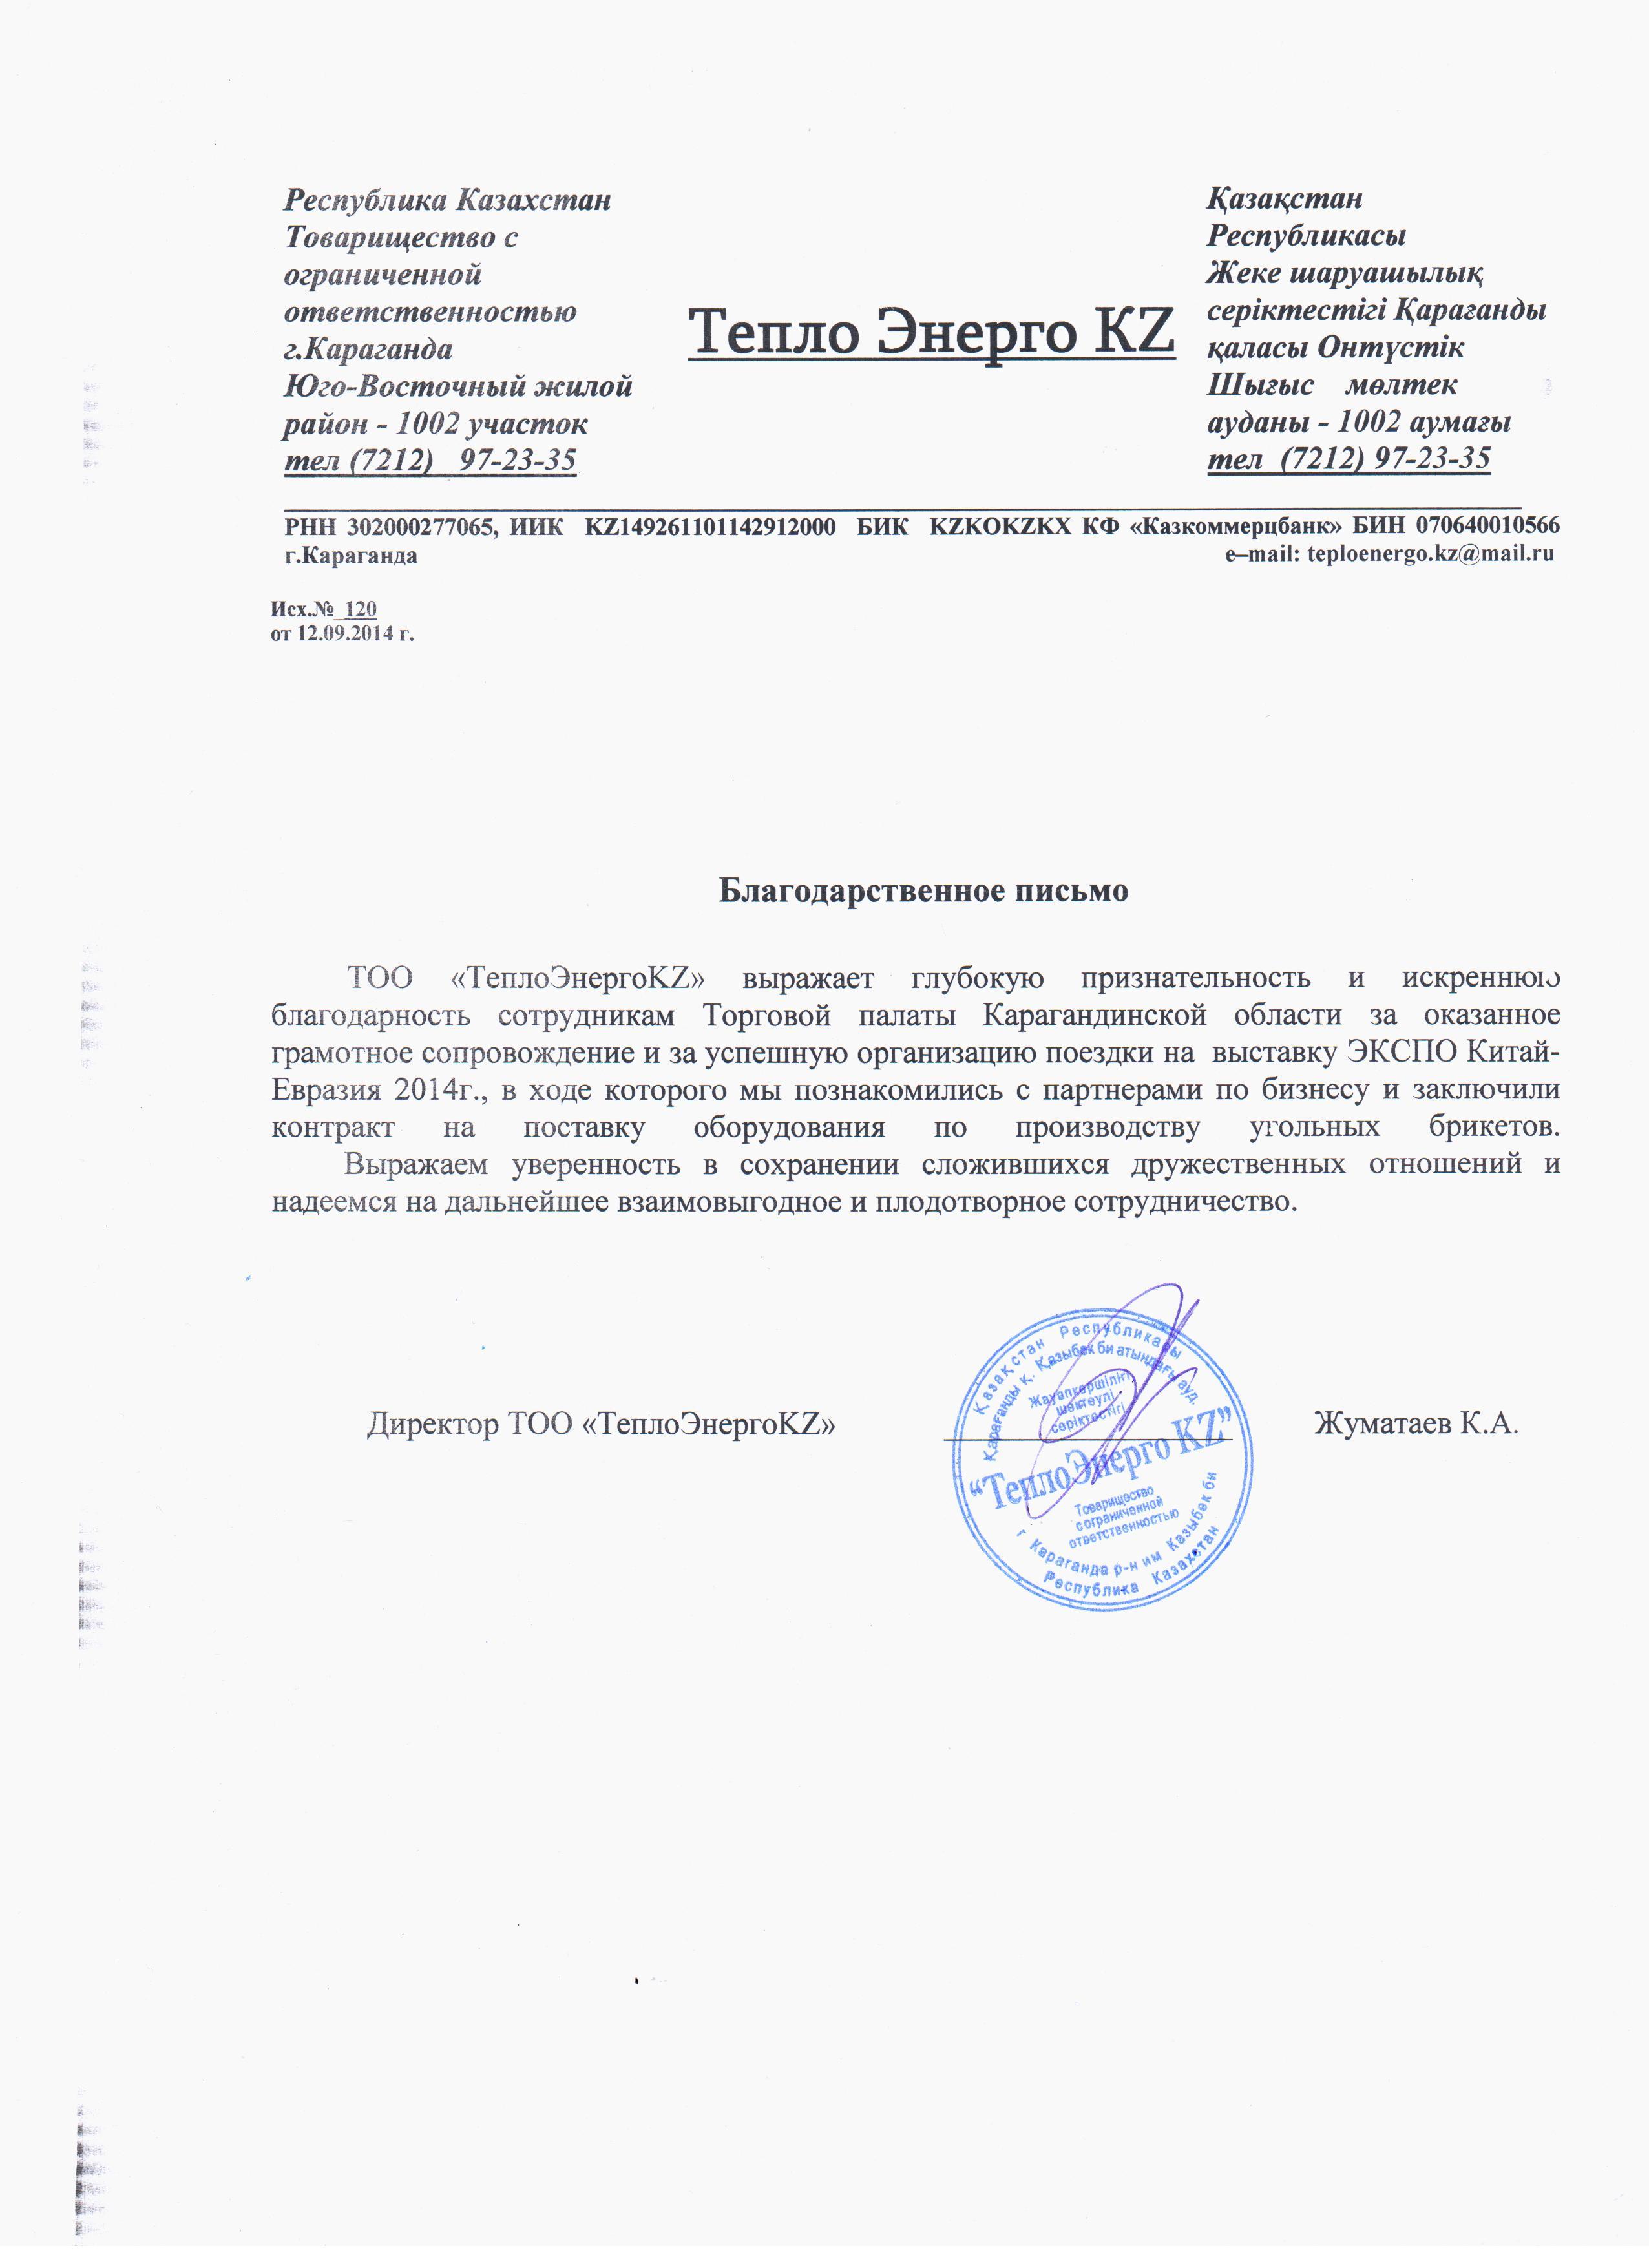 письмо презентация торгового предприятия